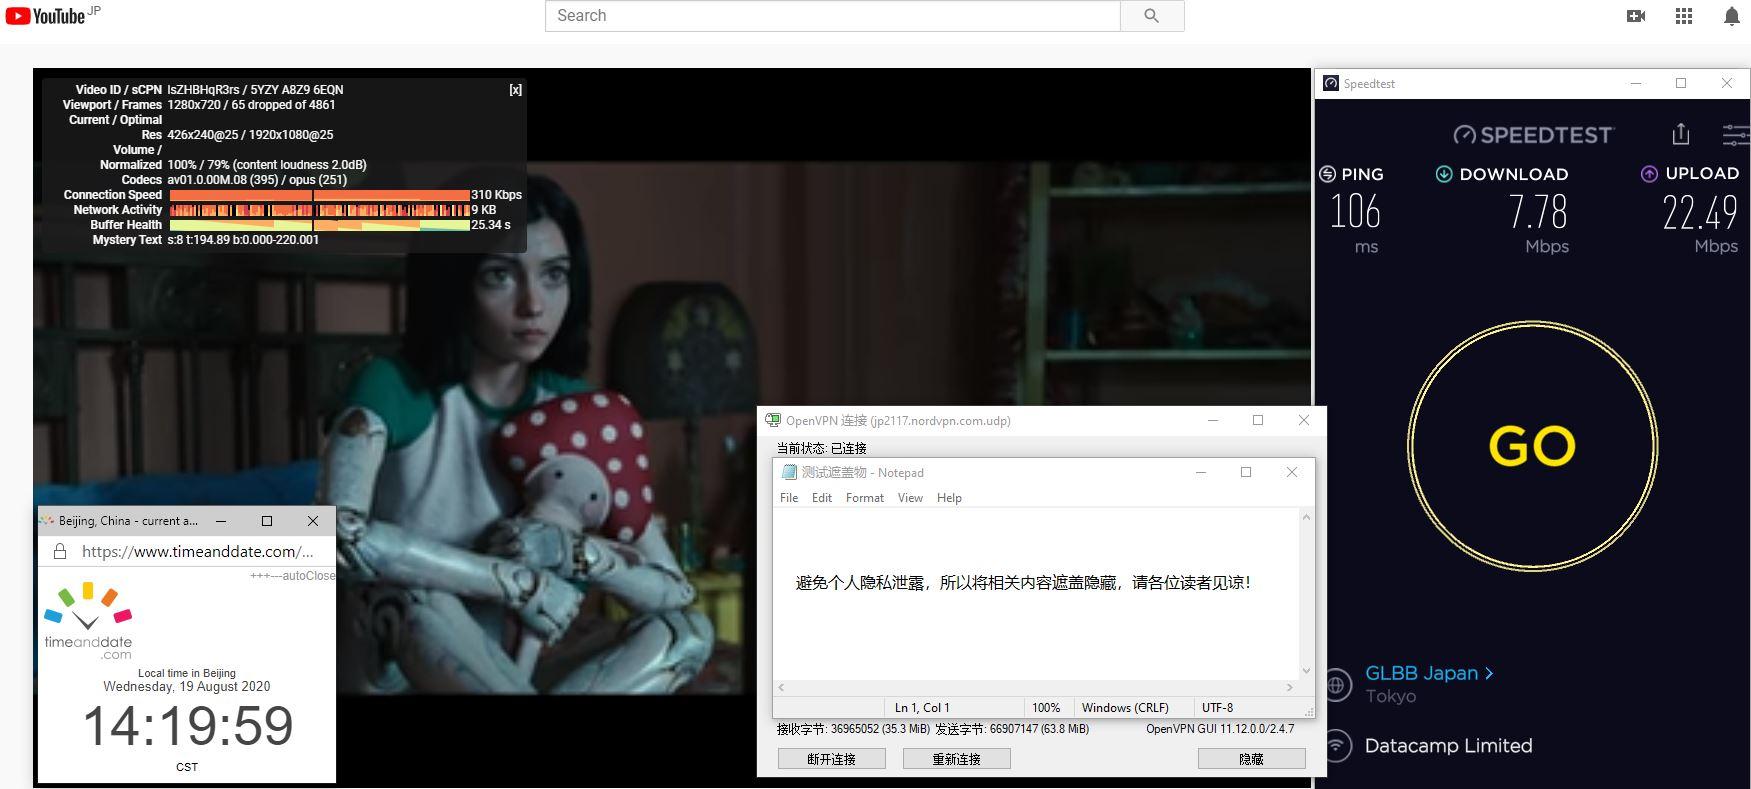 Windows10 NordVPN OpenVPN jp2117 中国VPN 翻墙 科学上网 翻墙速度测试 - 20200819